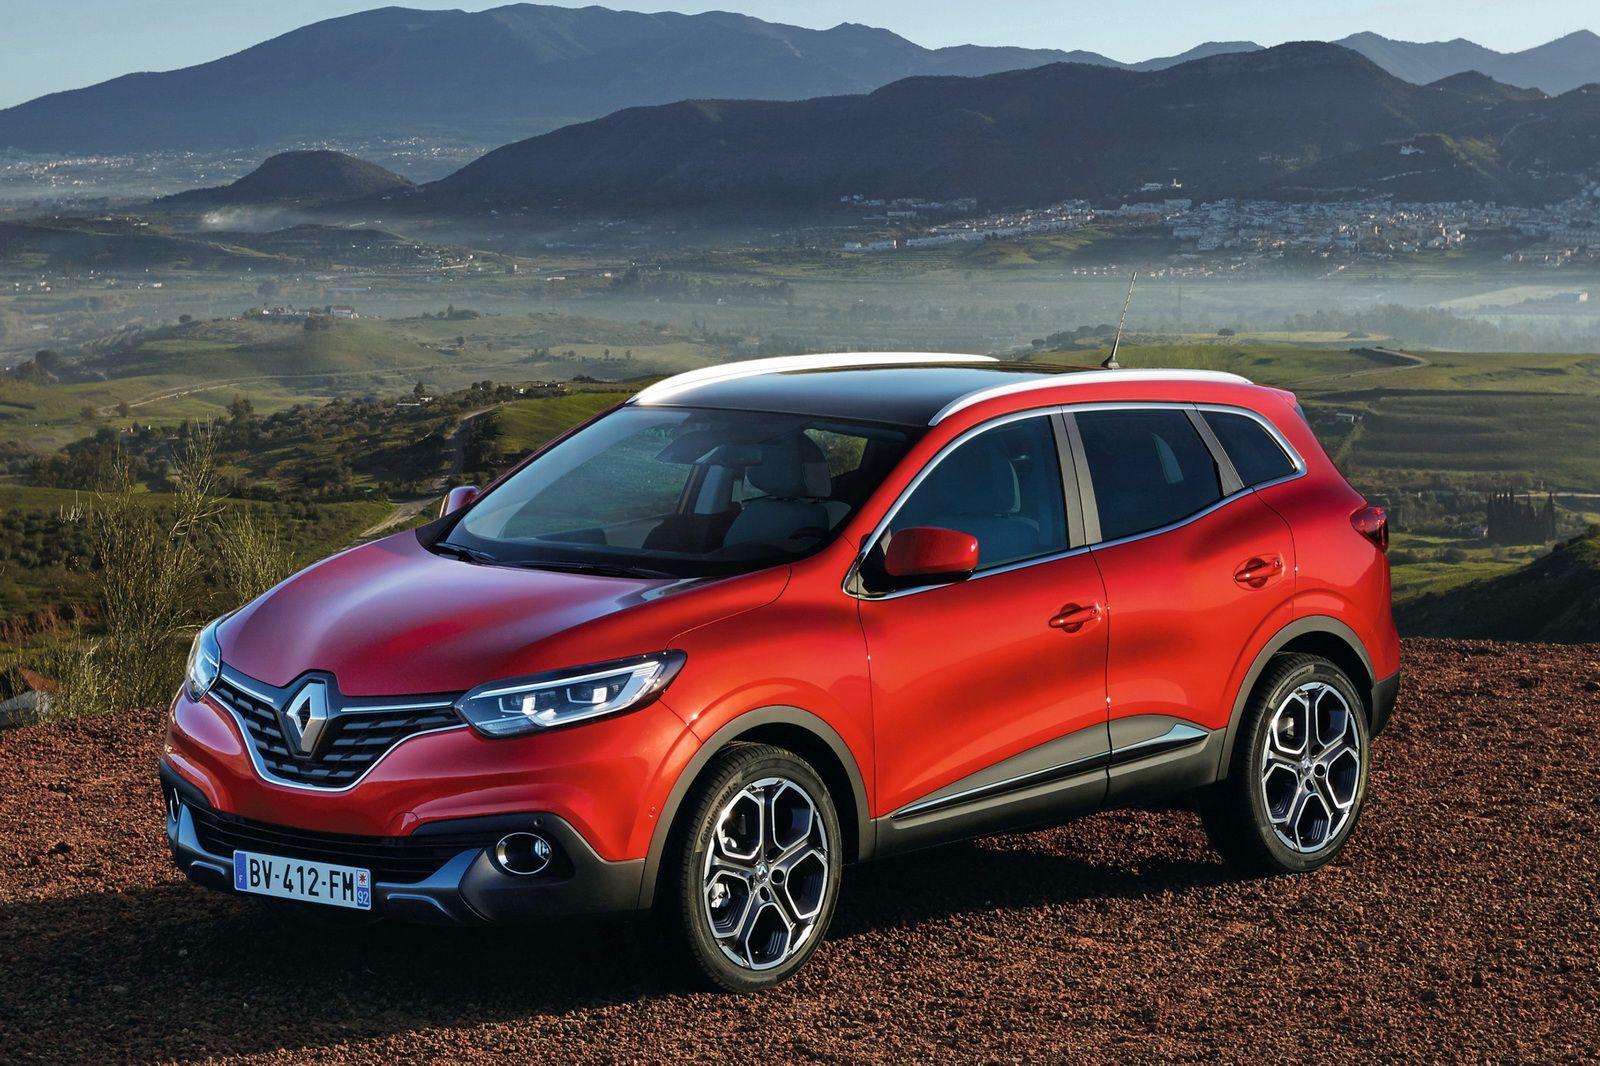 Renault Kadjar Fa Il Pieno Di Tecnologia Tehnika